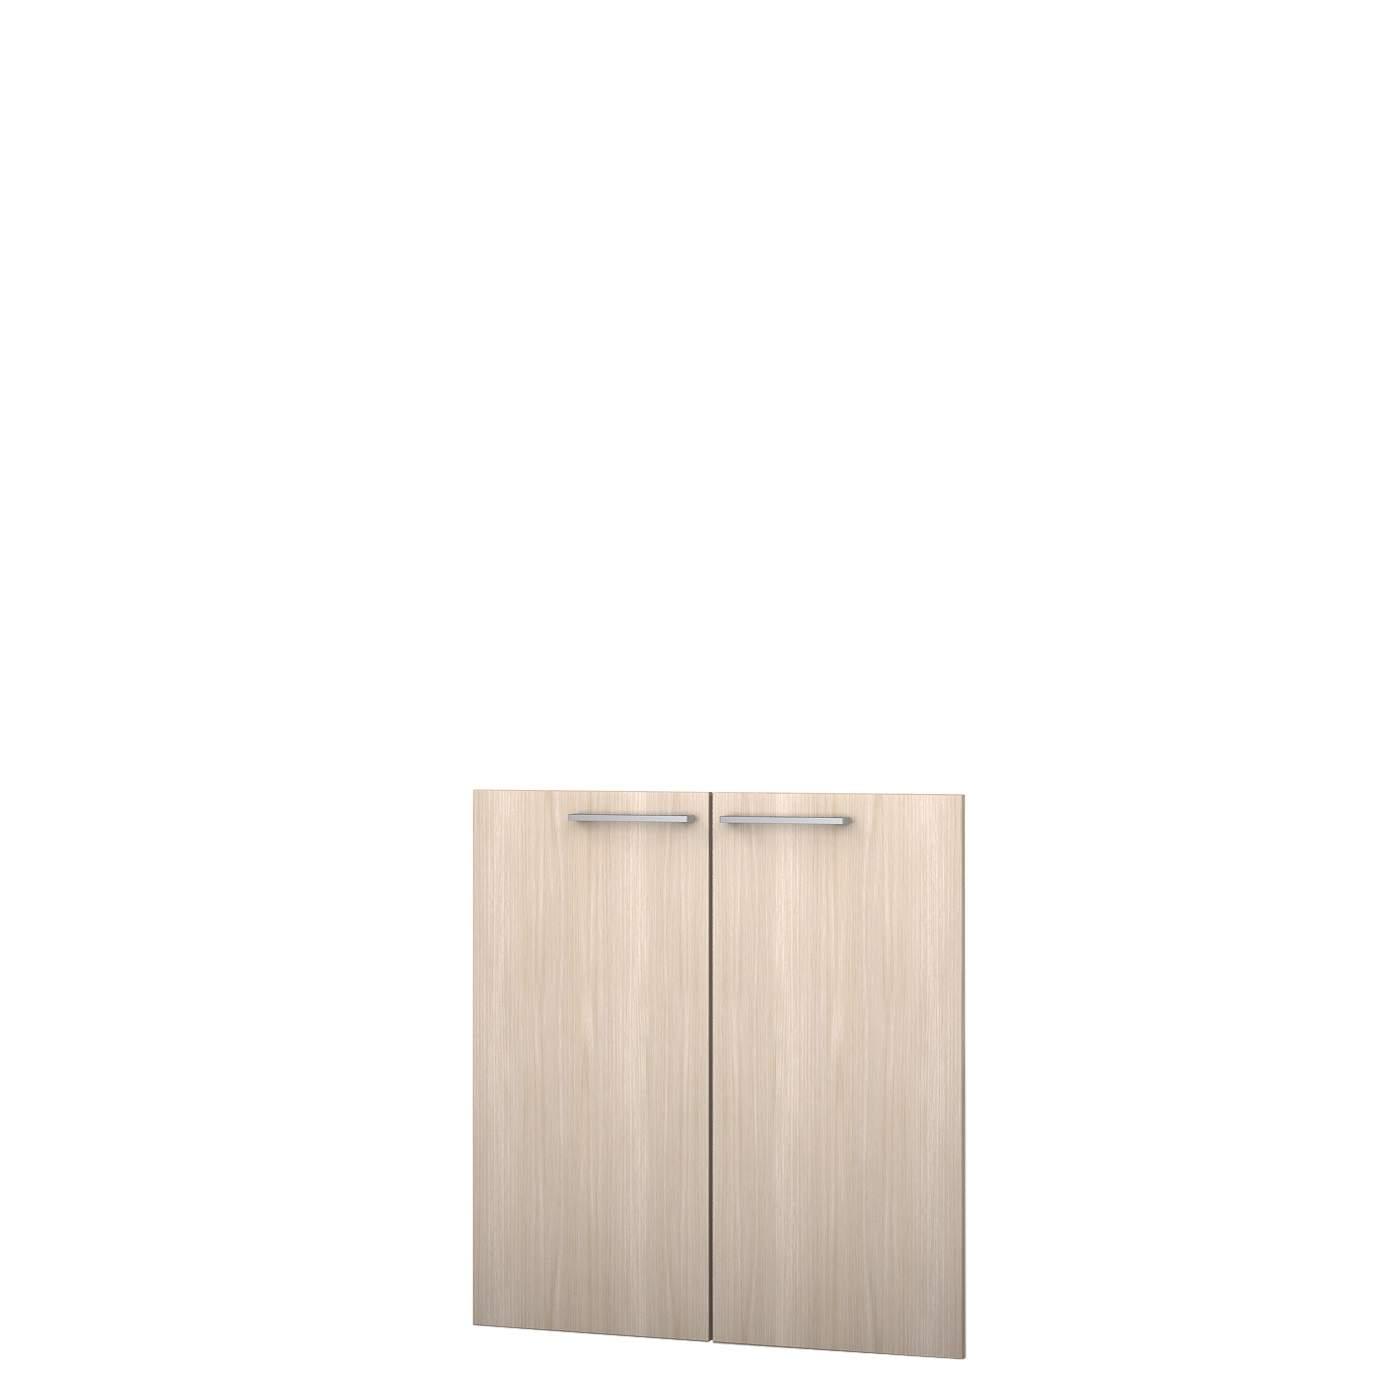 Комплект низких дверей 396х832х16 * 2